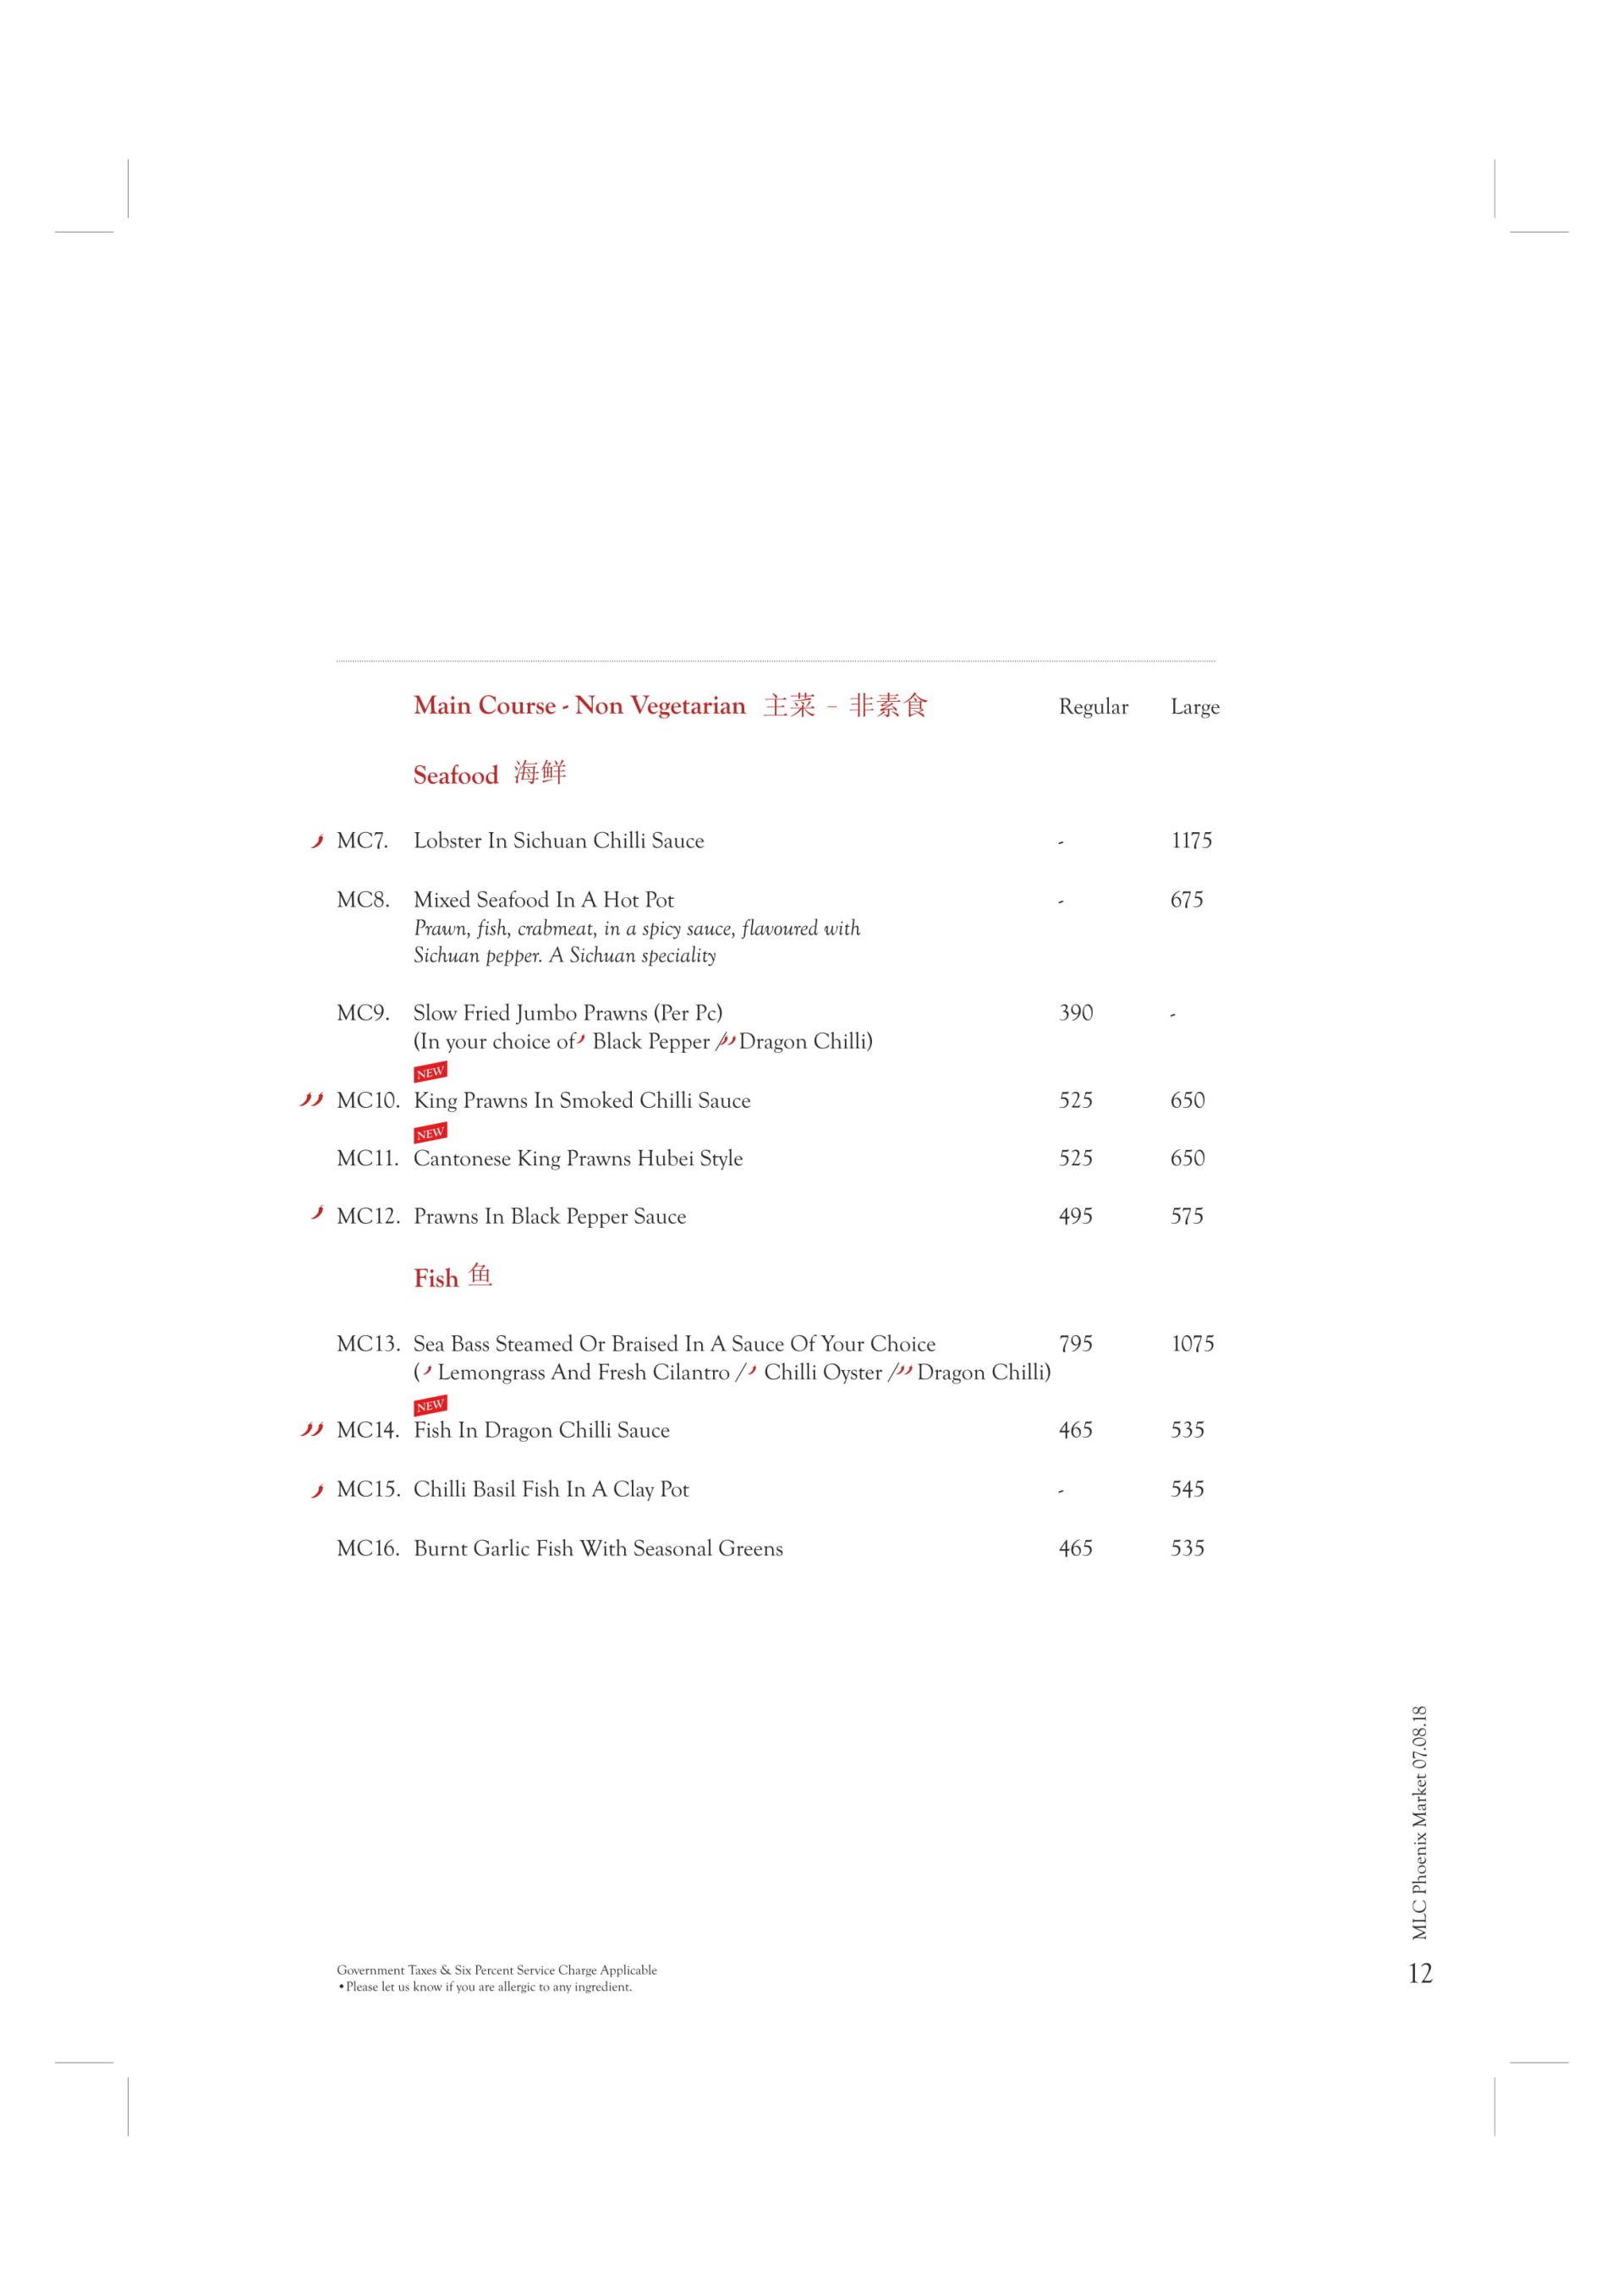 Menu of the Mainland China